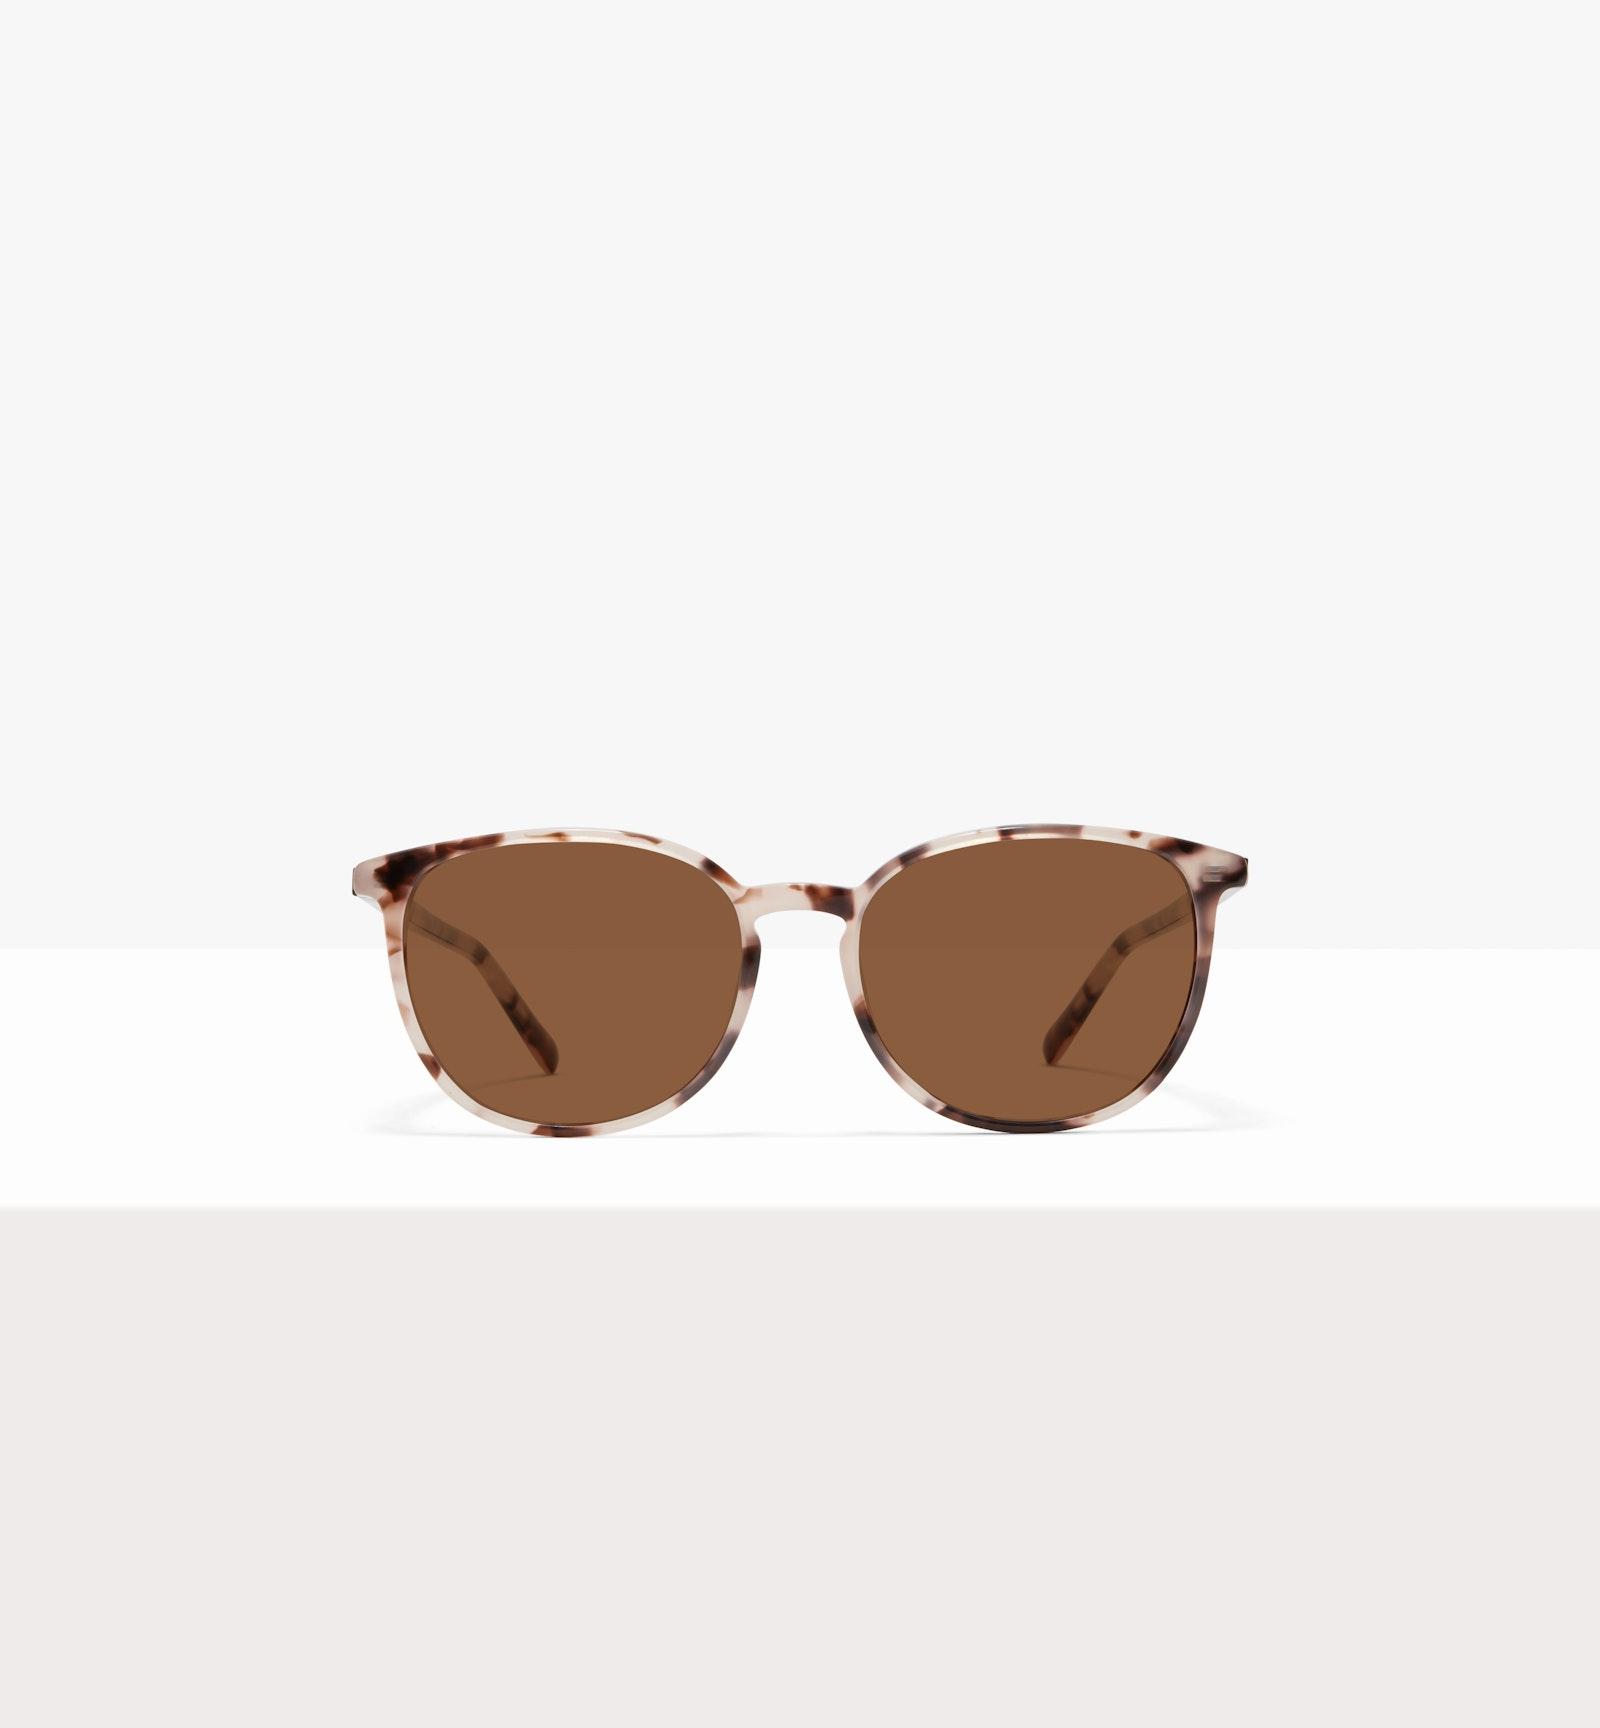 Affordable Fashion Glasses Round Sunglasses Women Femme Libre S Erzebeth